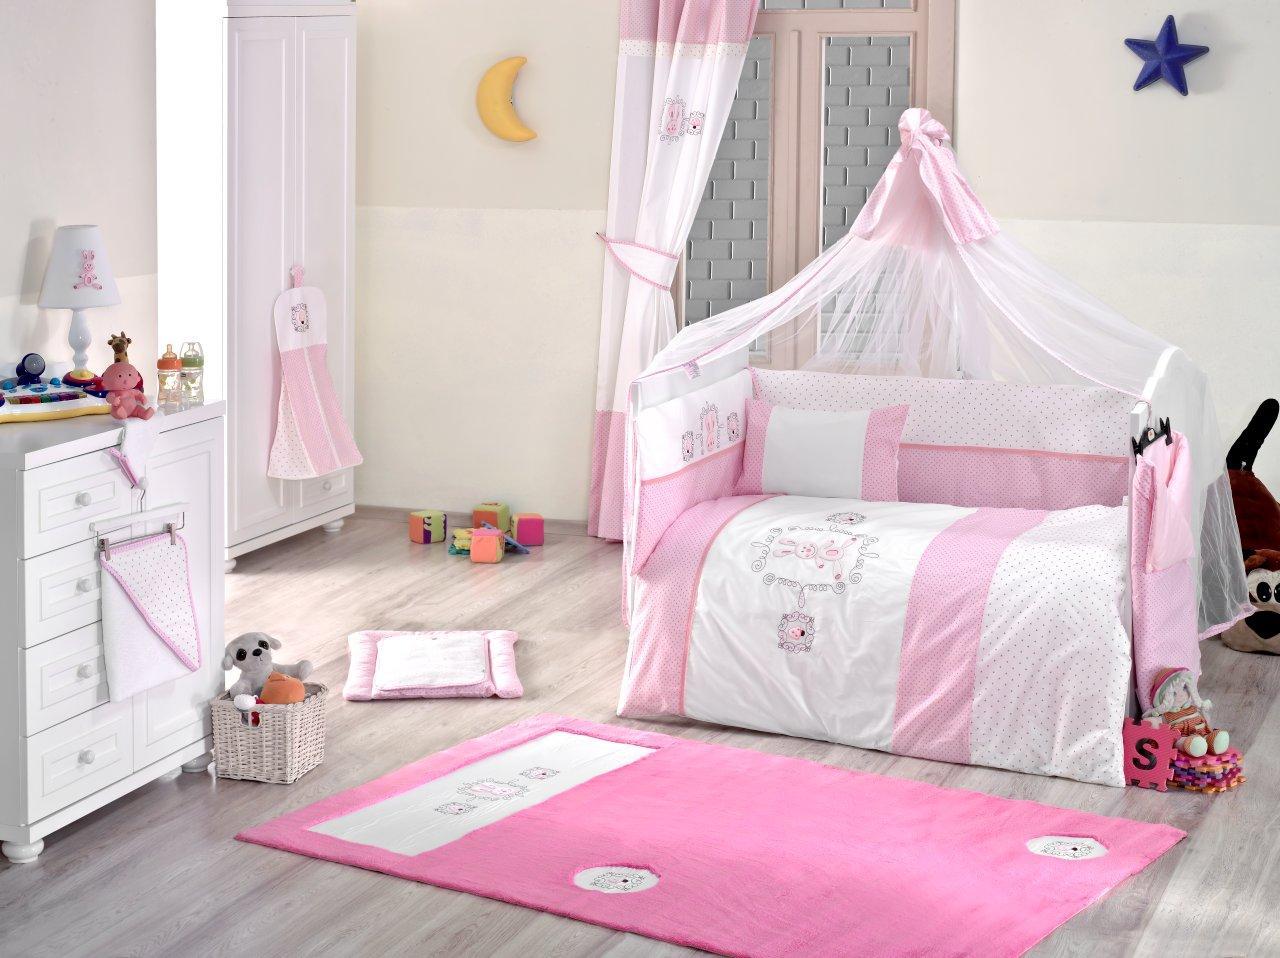 Купить Балдахин серии Rabitto, 150 х 450 см, розовый, Kidboo